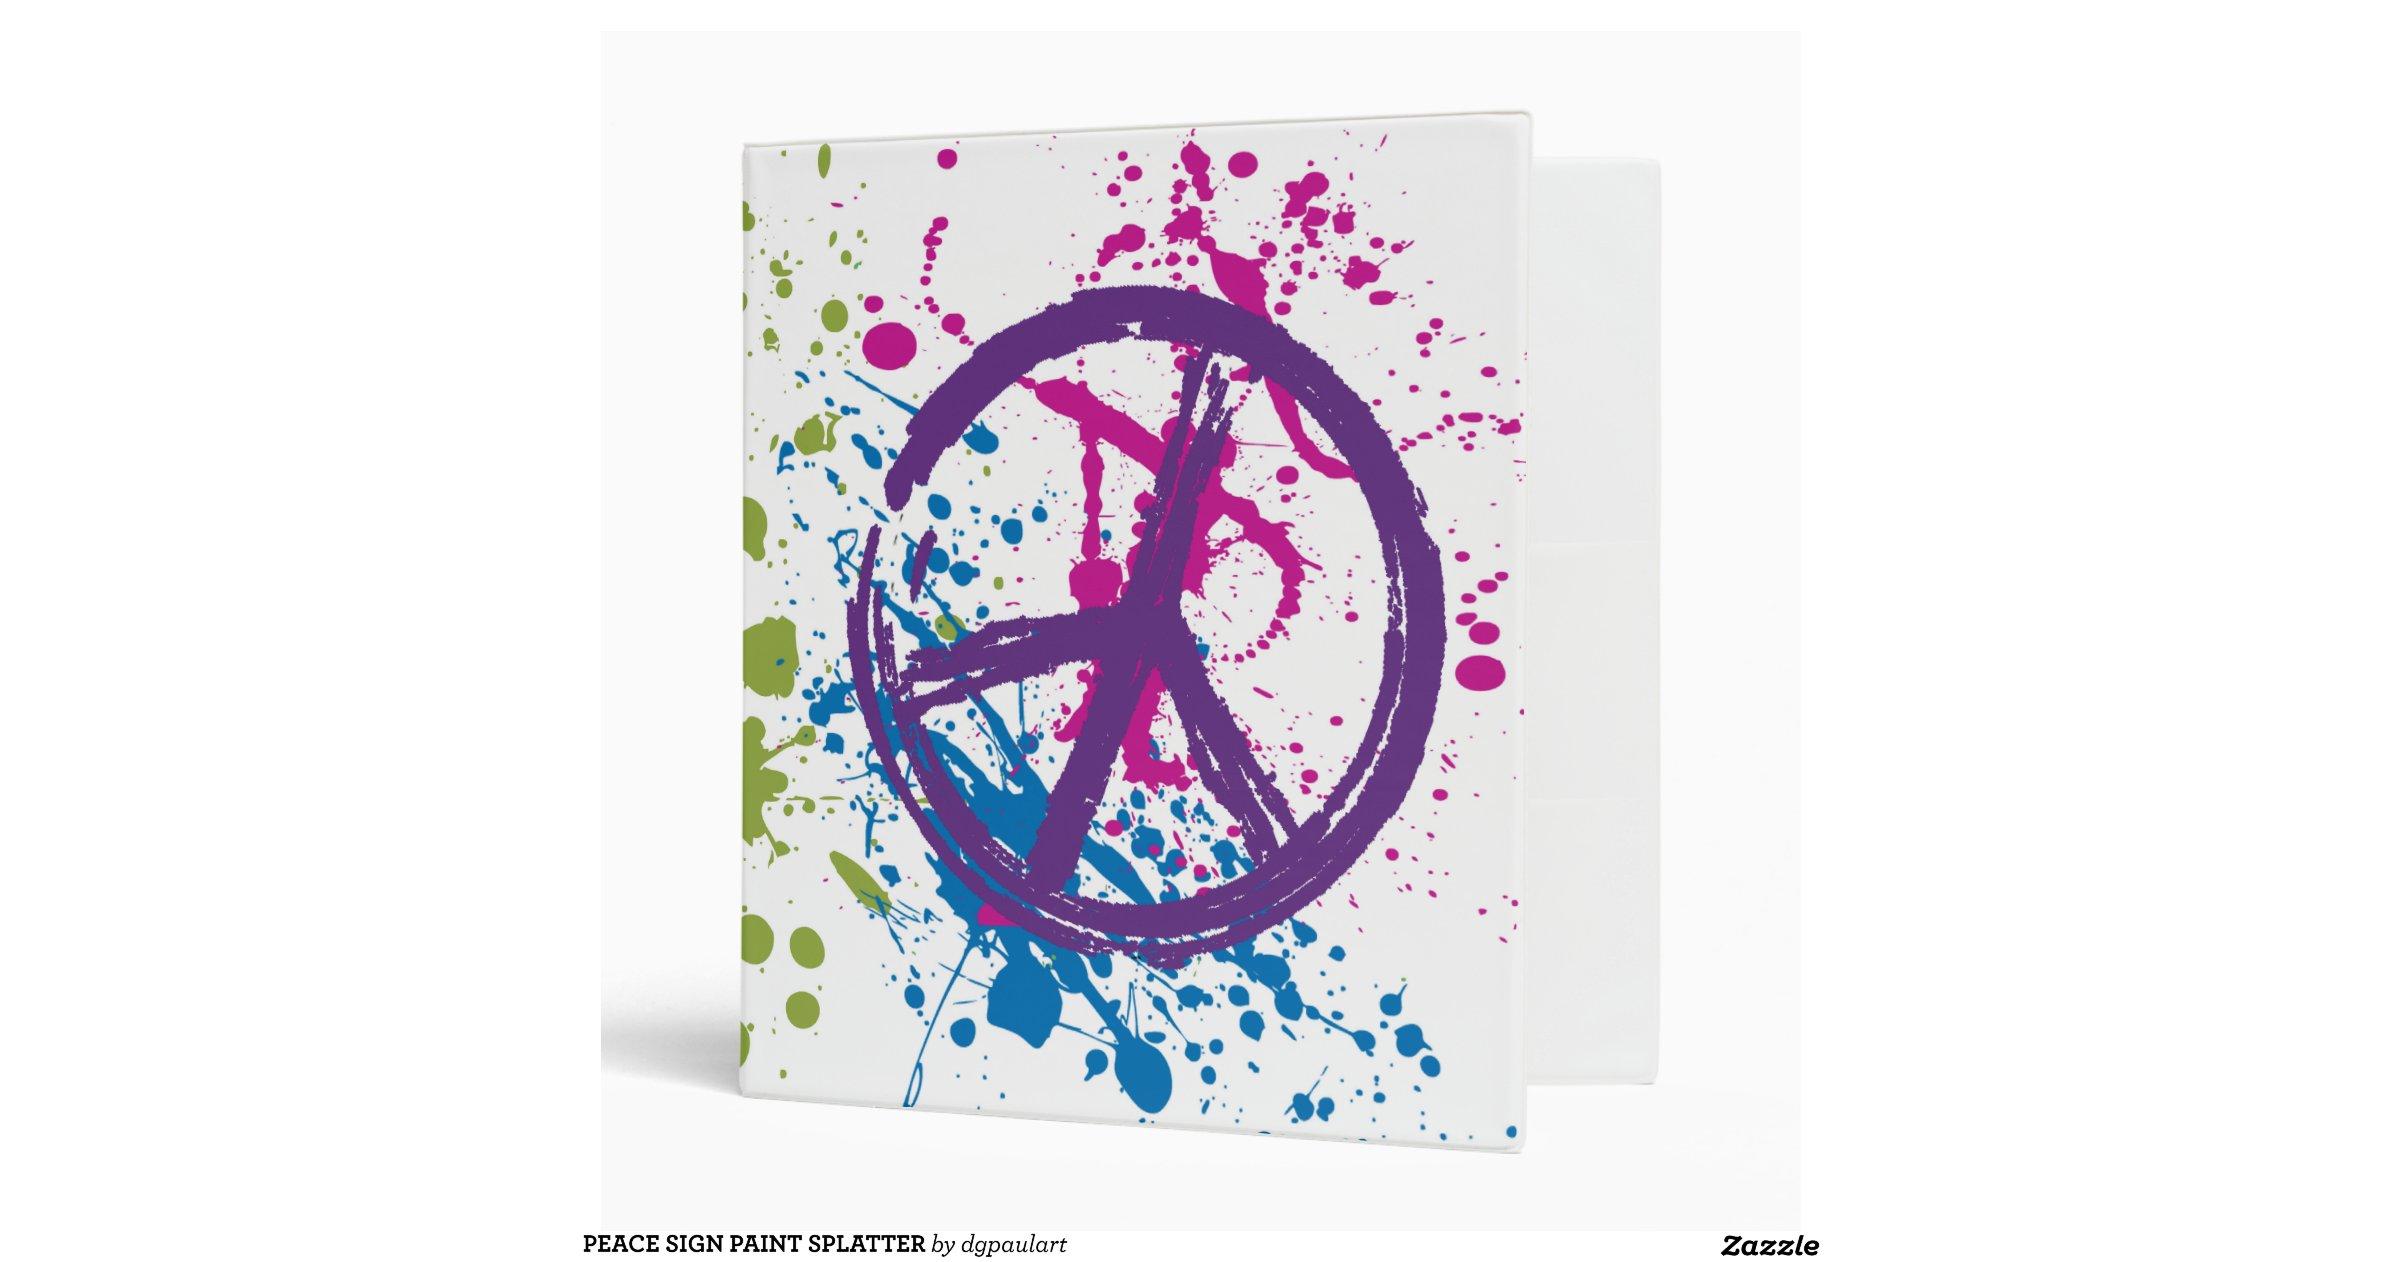 PEACE SIGN PAINT SPLATTER 3 RING BINDERS | Zazzle